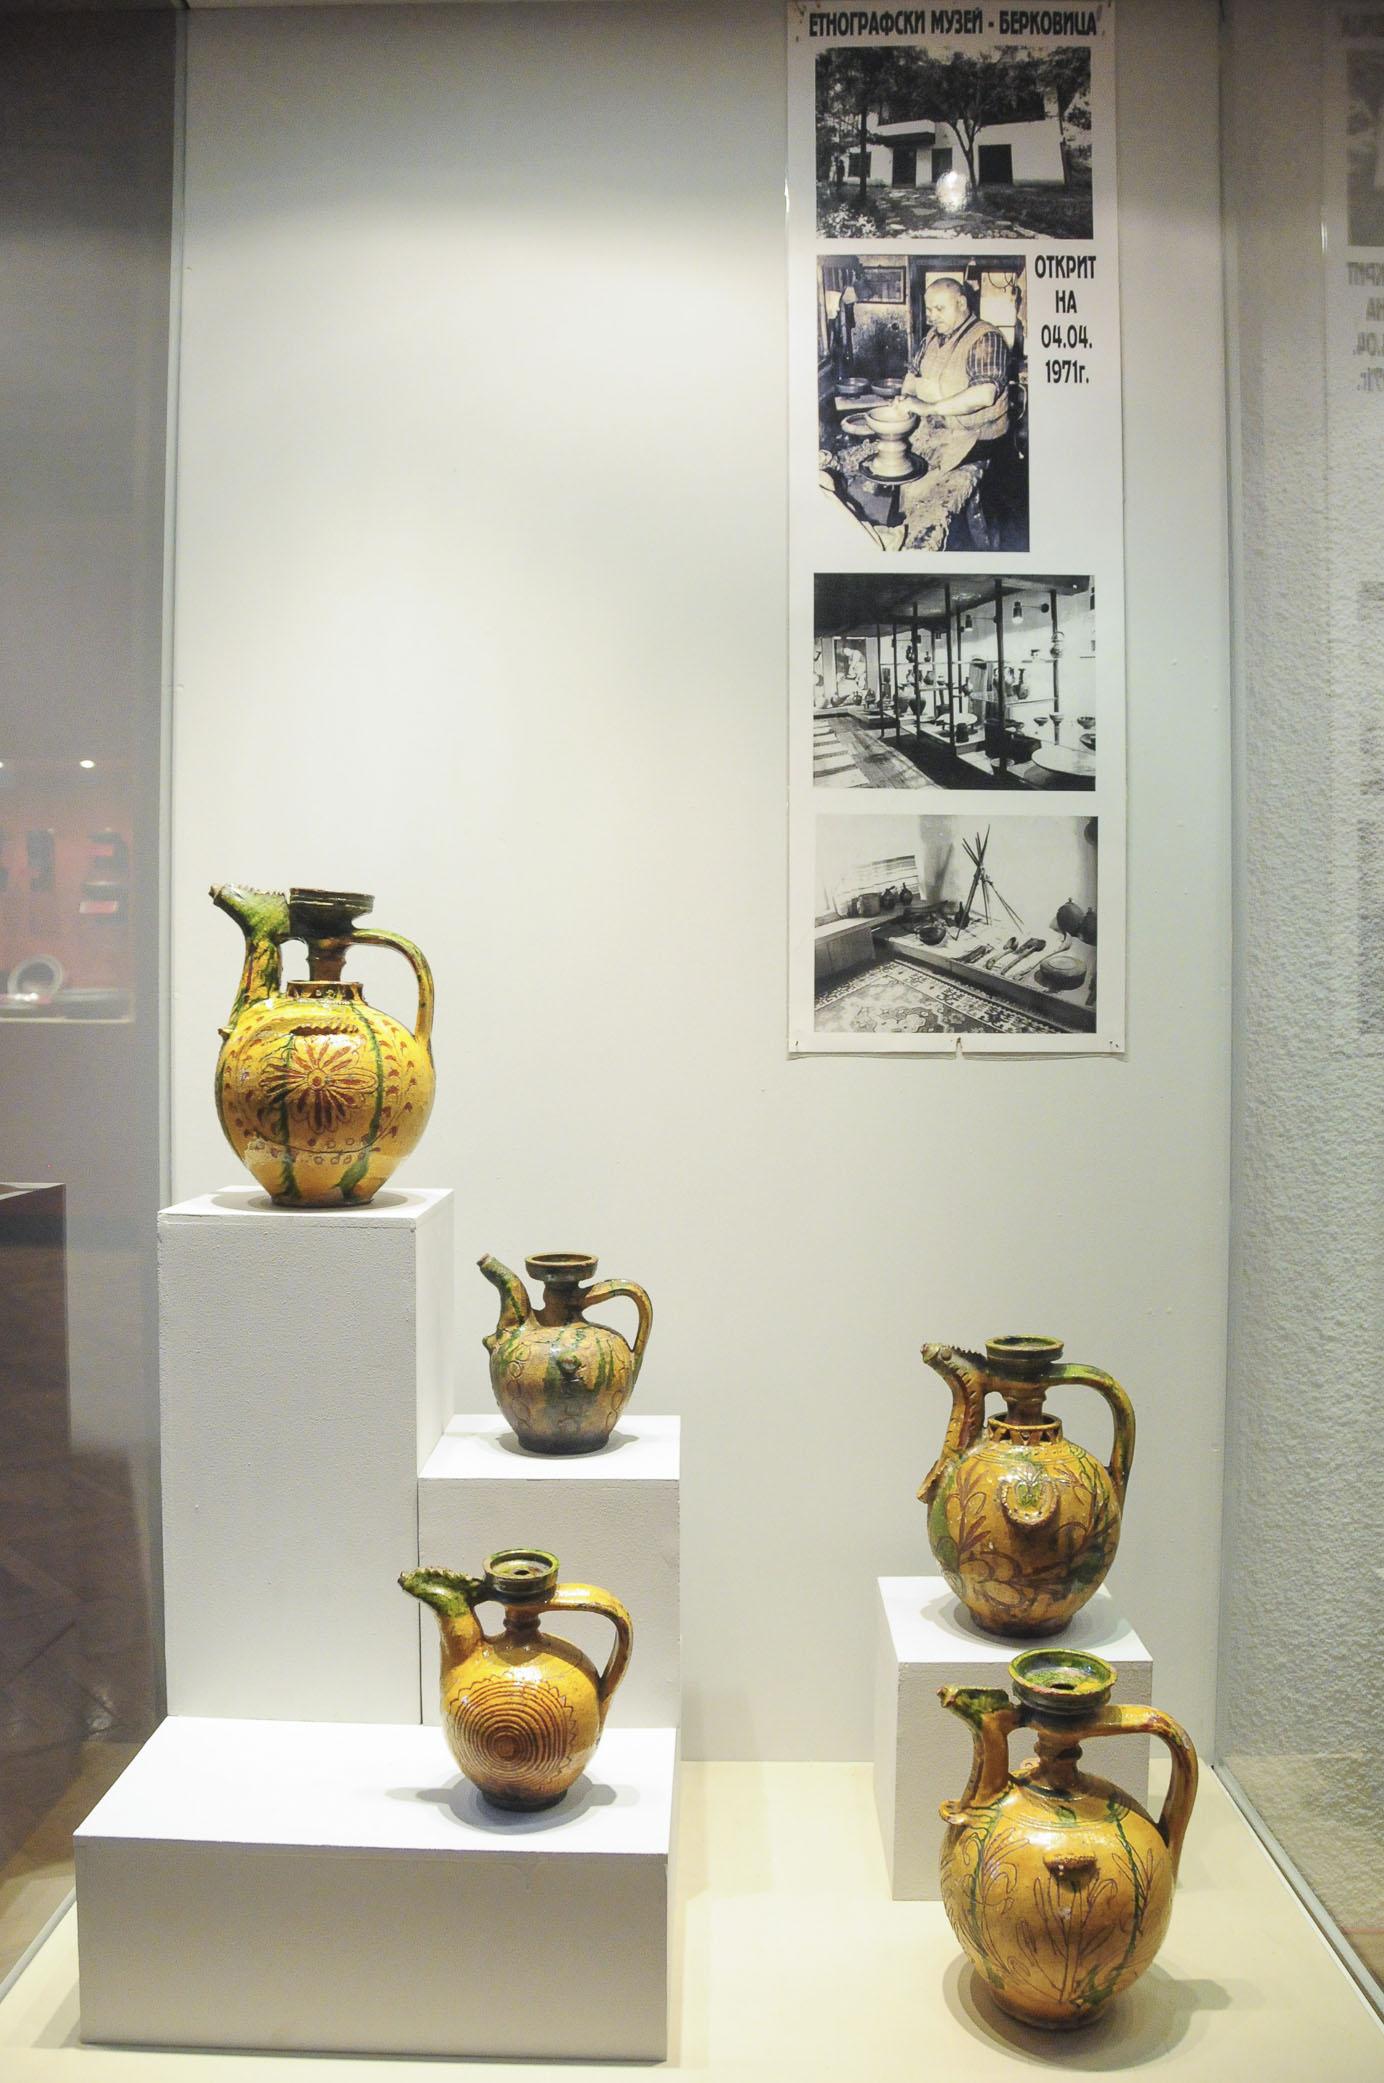 troyan-museum-magiata-na-severozapada-1